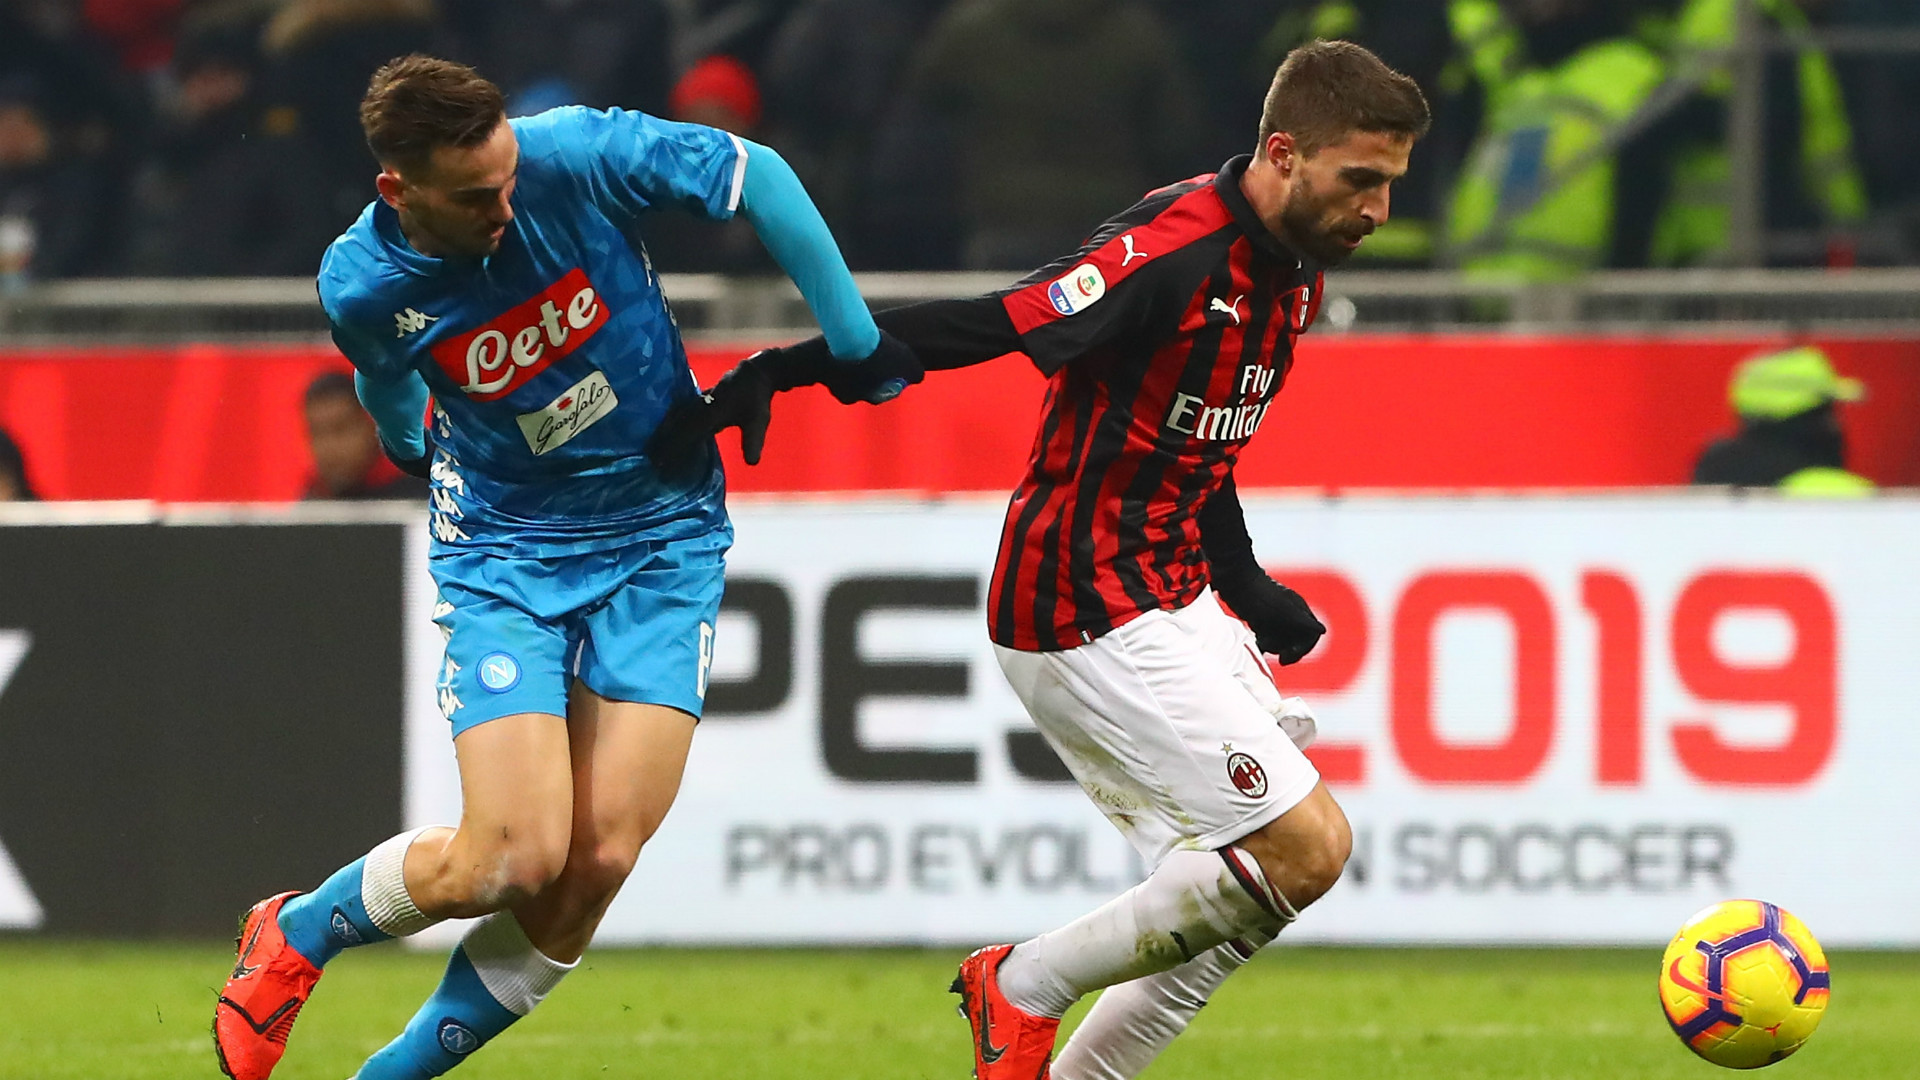 AC Milan Vs SSC Neapel Heute Live Im TV Und LIVE STREAM